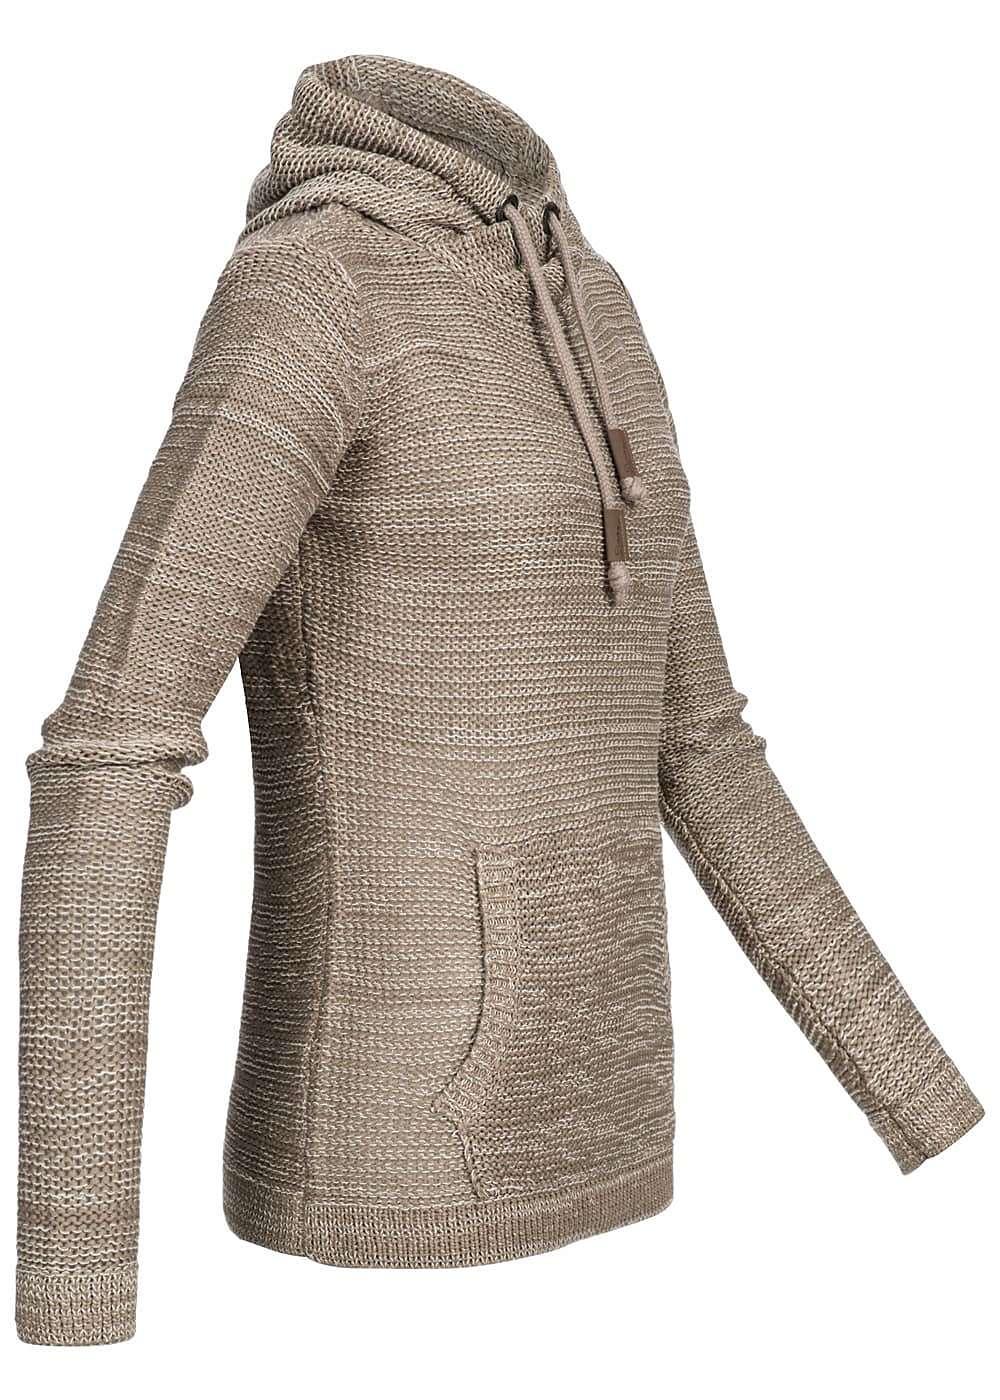 seventyseven lifestyle damen grobstrick hoodie kapuze k ngurutasche beige weiss 77onlineshop. Black Bedroom Furniture Sets. Home Design Ideas